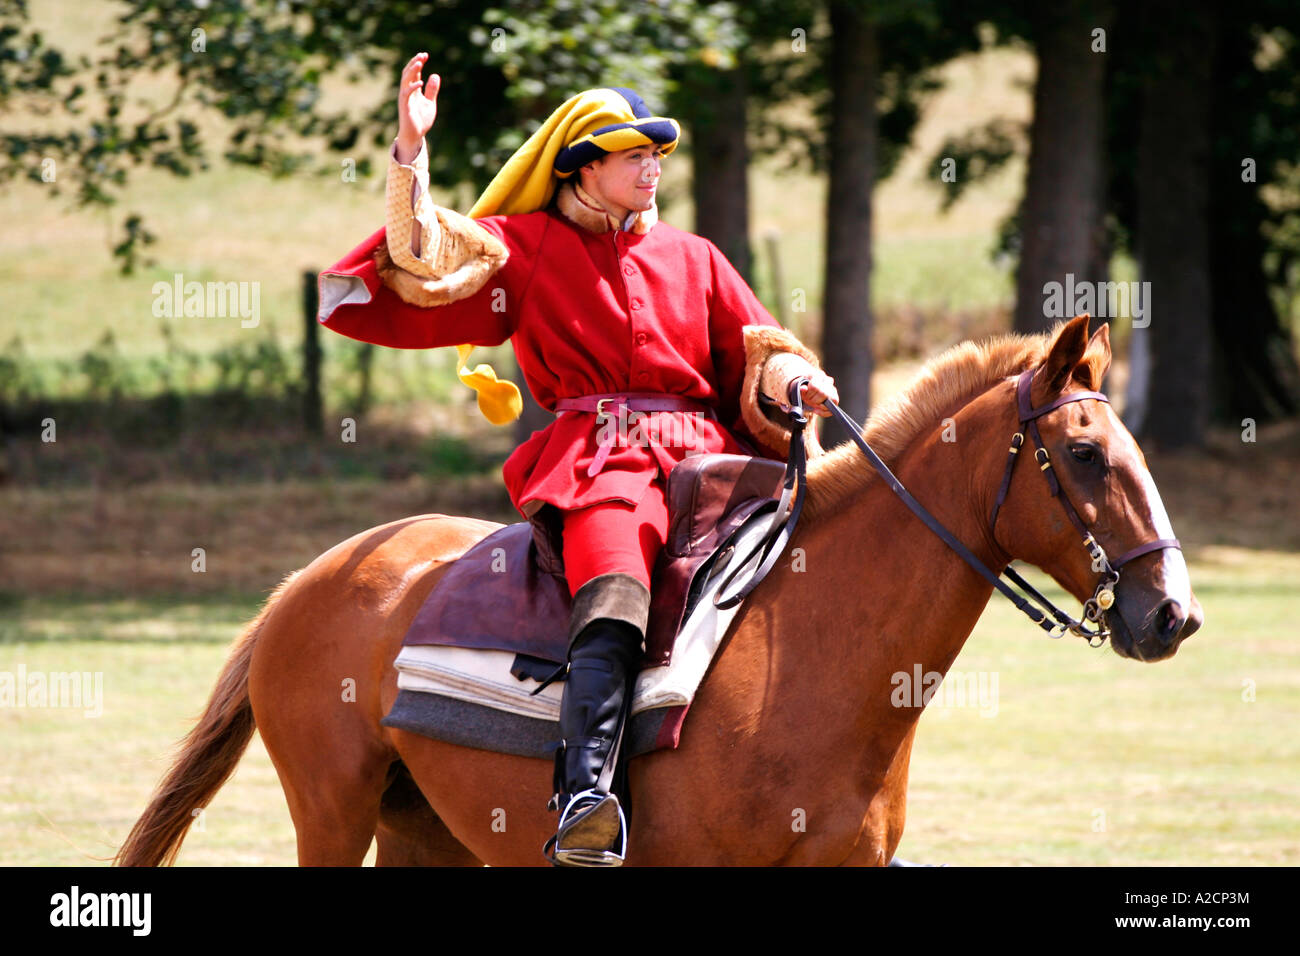 Knight on Horseback, Knights Tournament, Kirby Hall, Northamptonshire - Stock Image